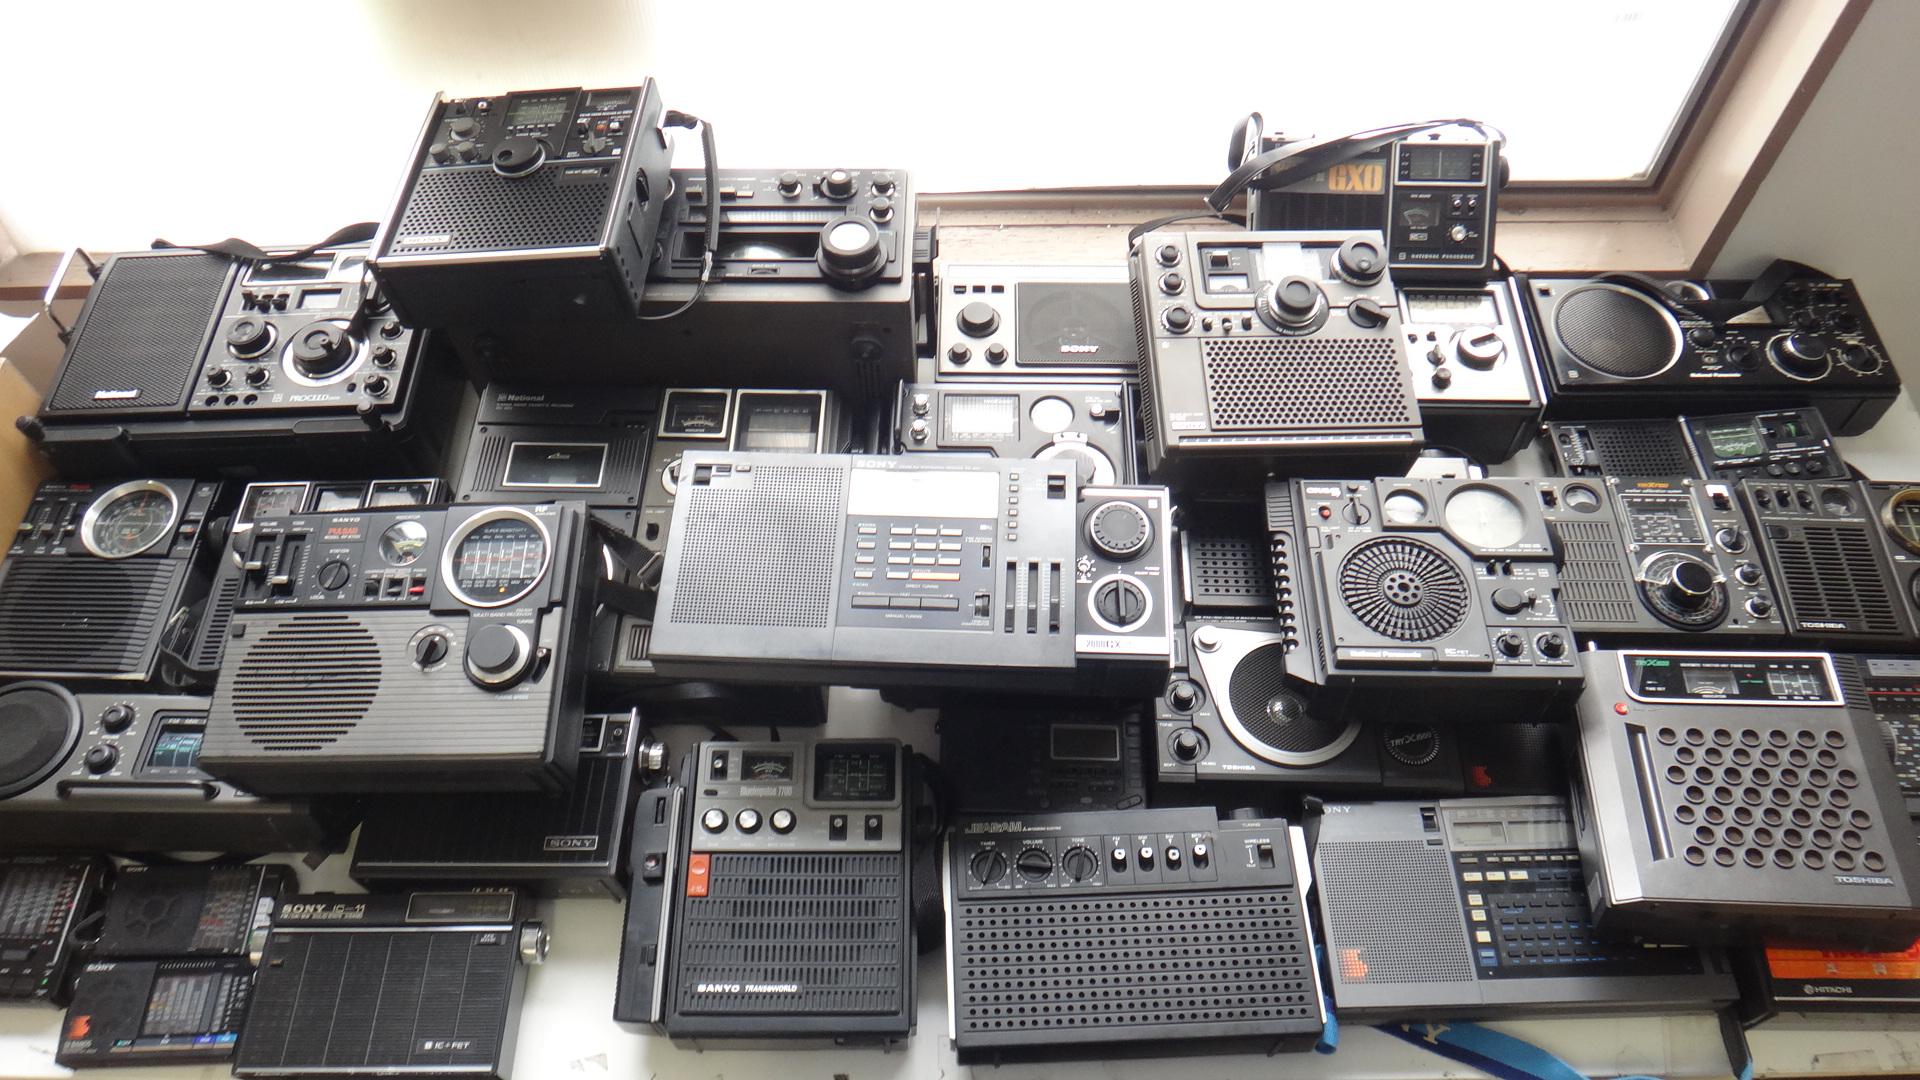 DSC02514 短波ラジオなどラジオ76台を買い取りさせて頂きました。 当時からコツコツ集めら